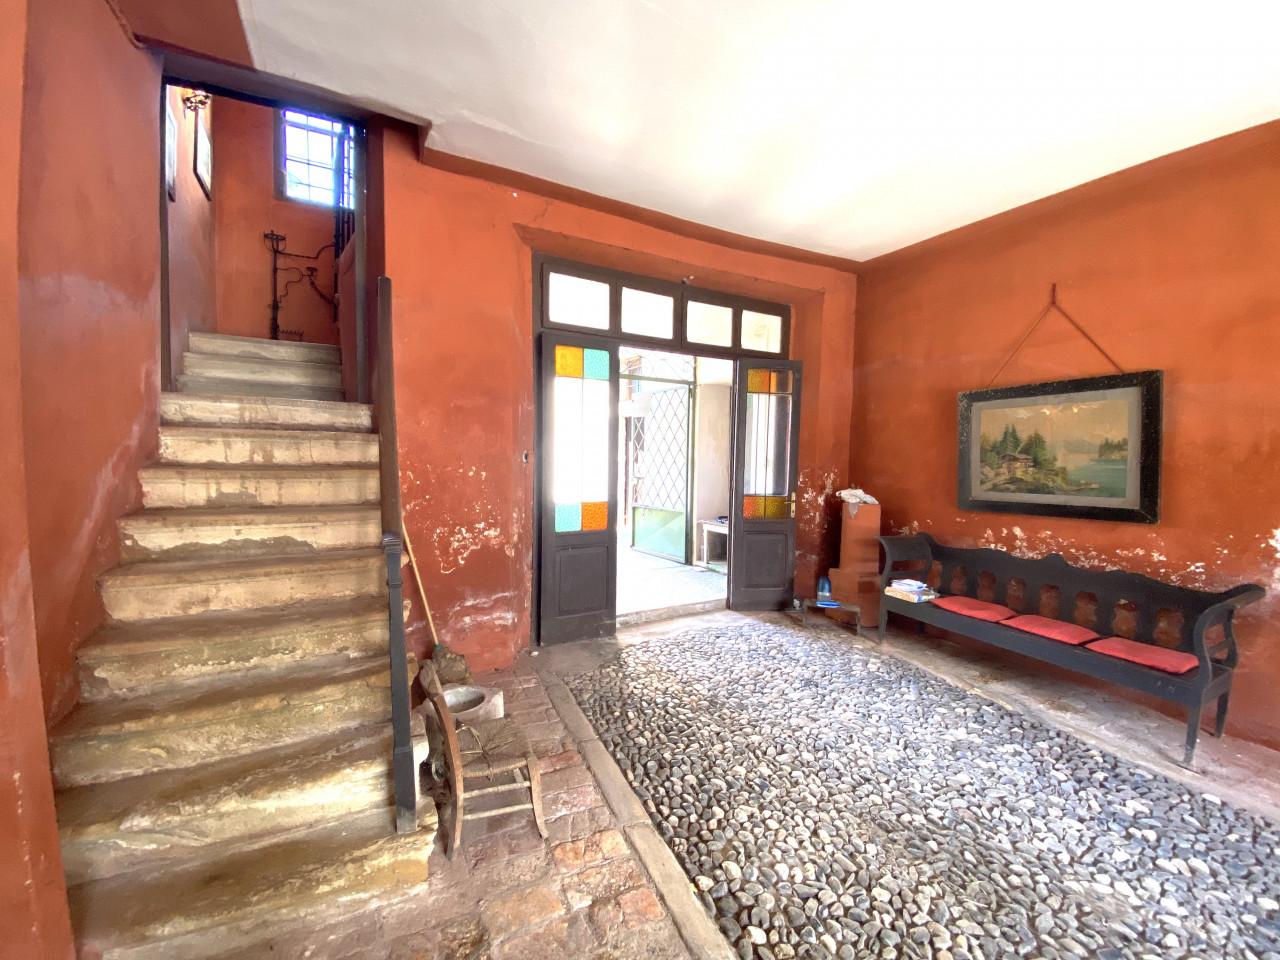 Dimora Storica in vendita in Centro a Valvasone - Rif.P1 https://images.gestionaleimmobiliare.it/foto/annunci/200820/2282895/1280x1280/003__img_3549.jpg